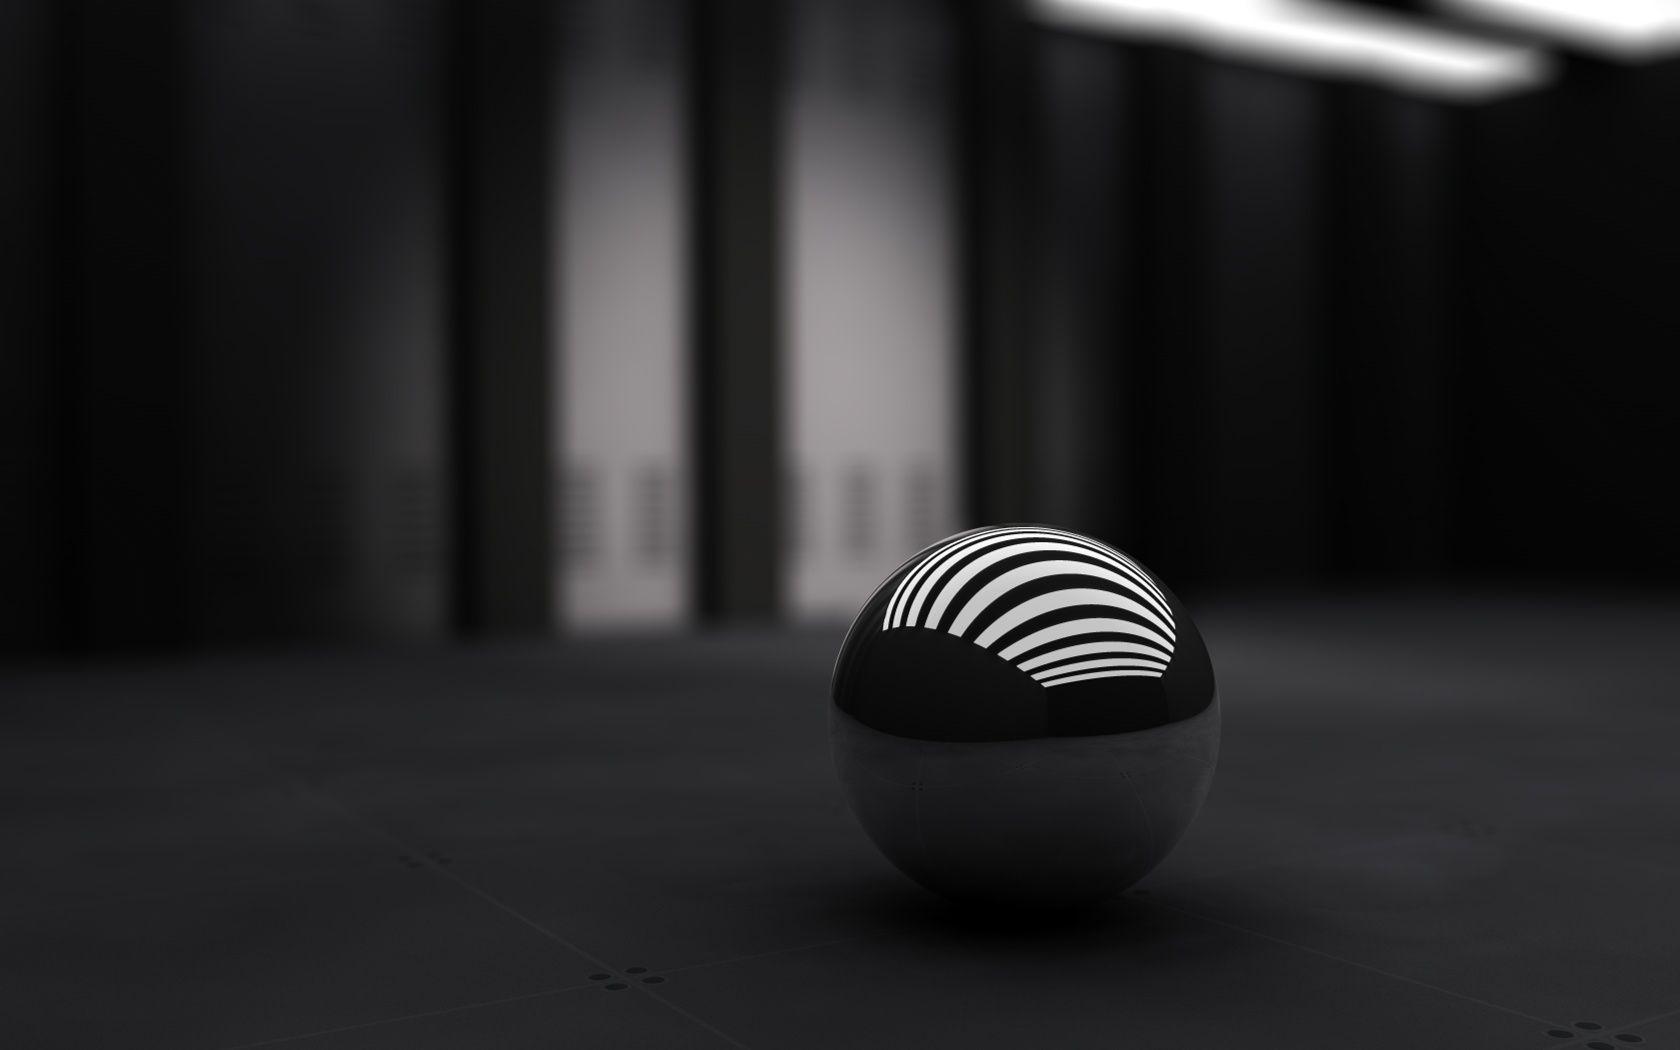 3d Black Ball Wallpaper Hd Dark Wallpaper Black Wallpaper Hd Dark Wallpapers